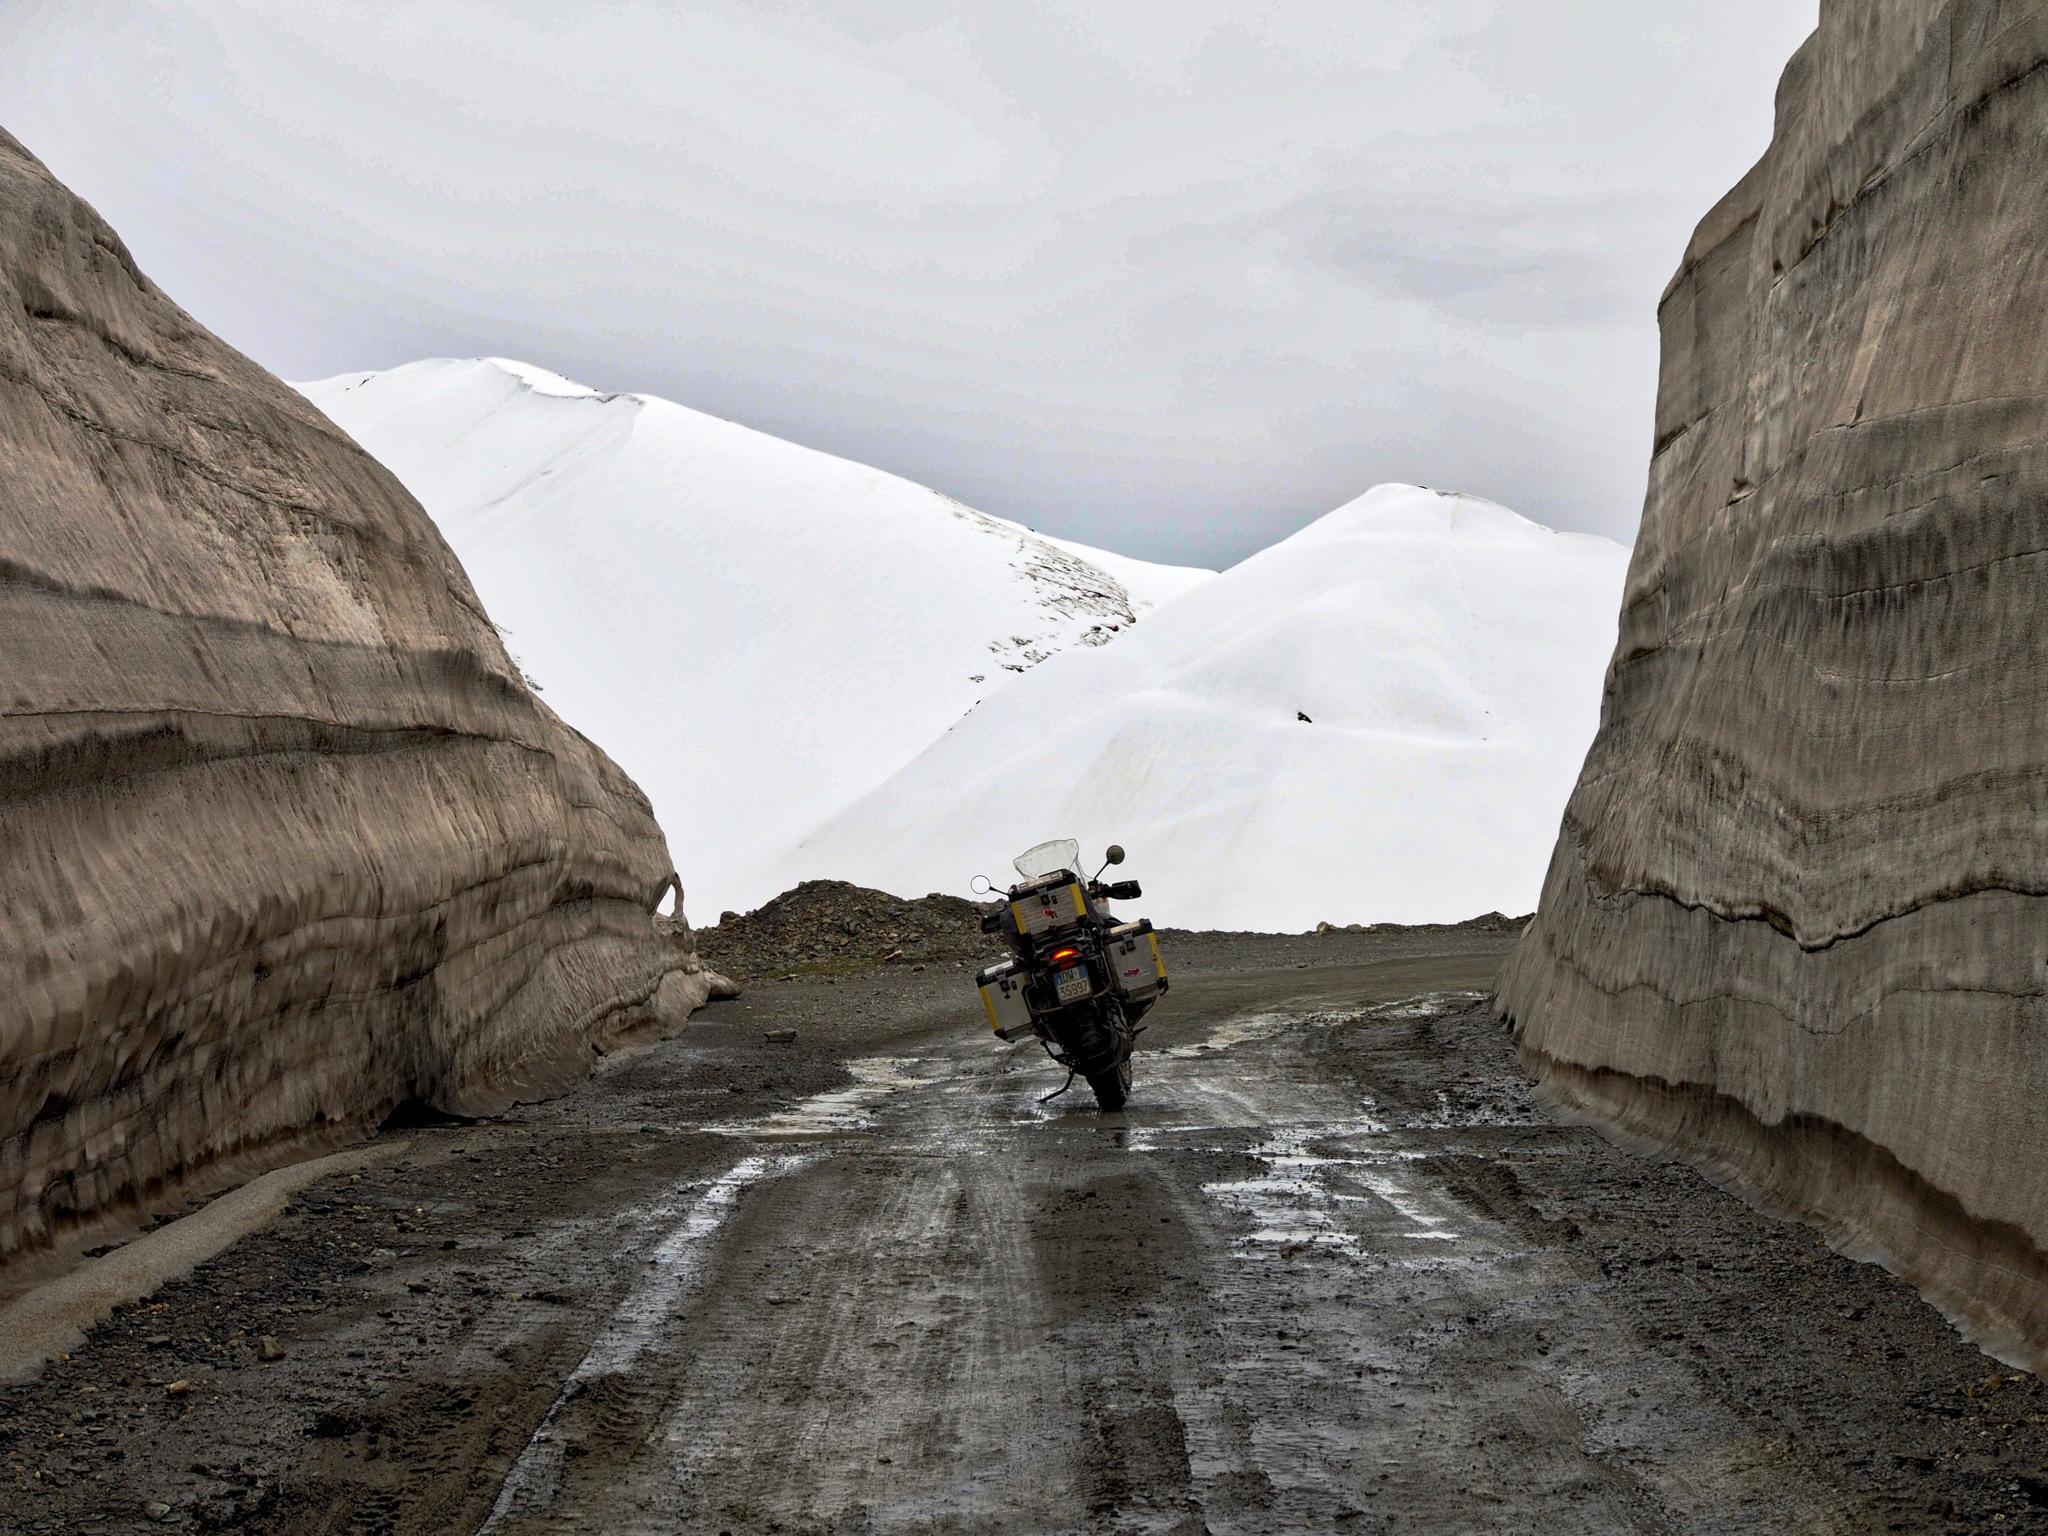 Muddy trail into the white by Dietrik Vr